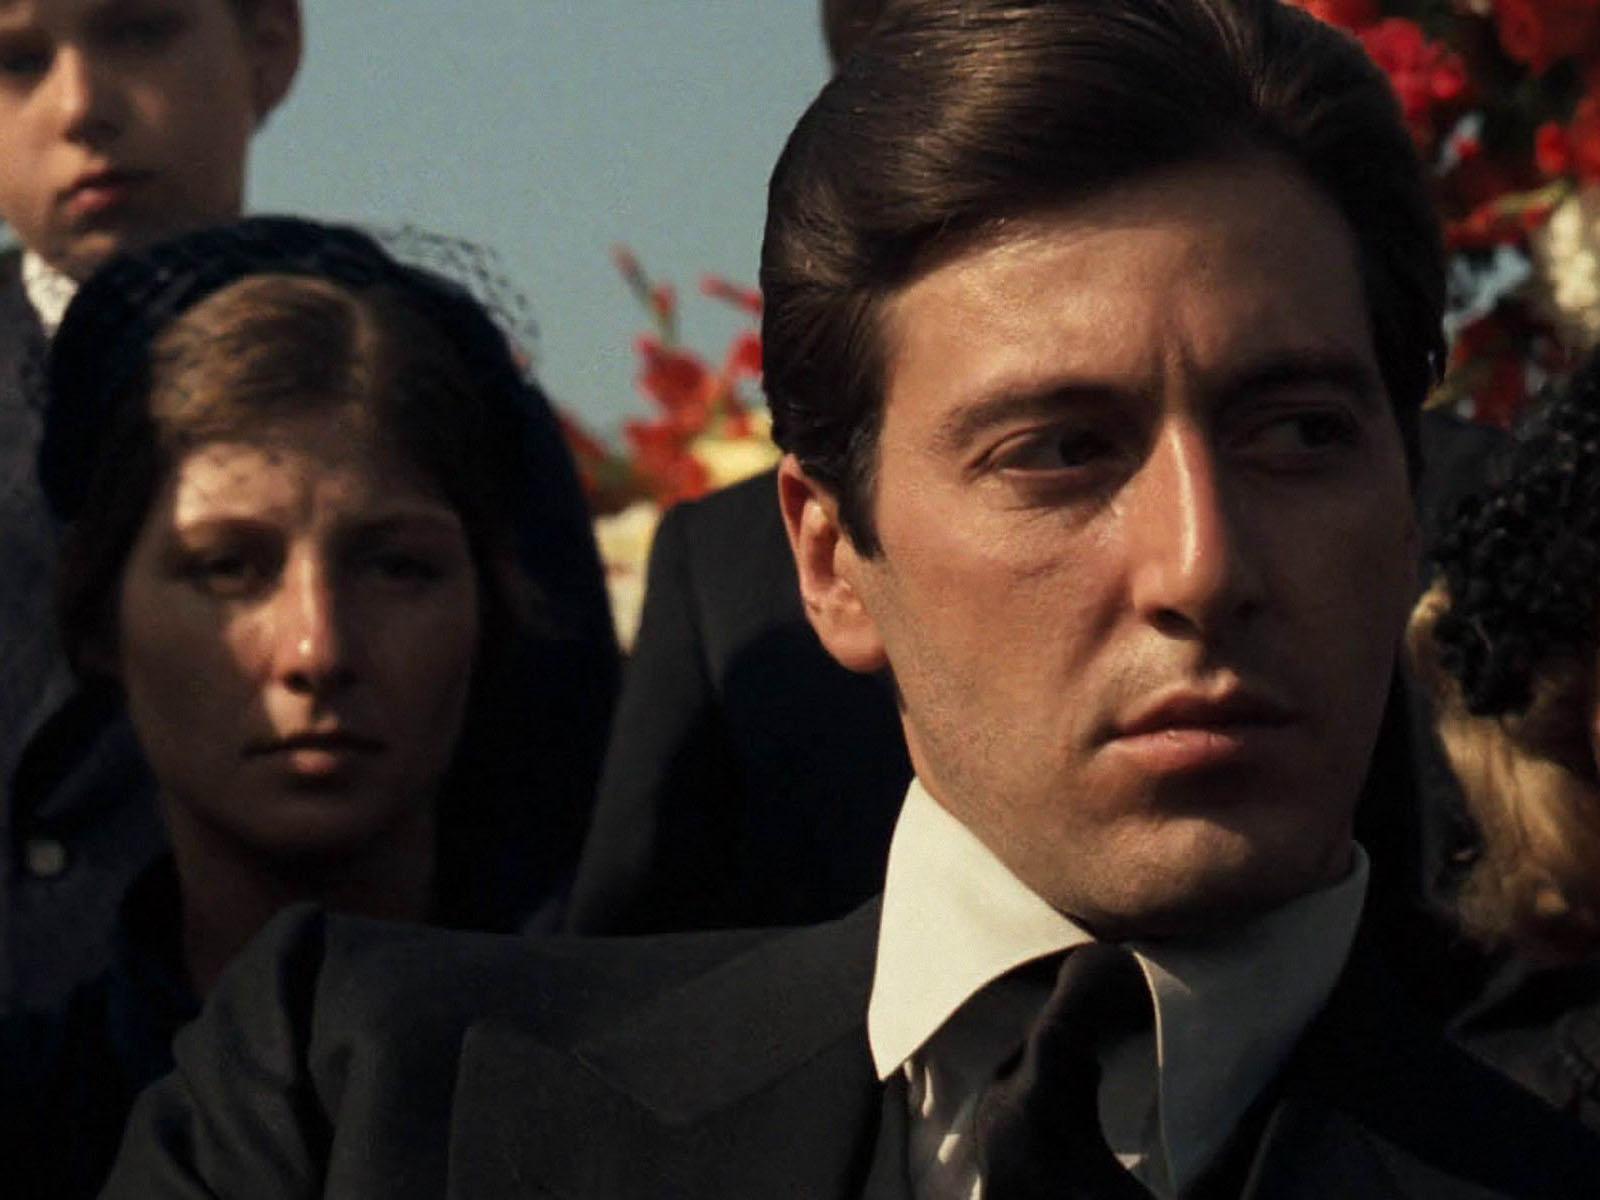 Godfather Wallpaper / Movie Hd Backgrounds - Godfather Part 1 Al Pacino - HD Wallpaper